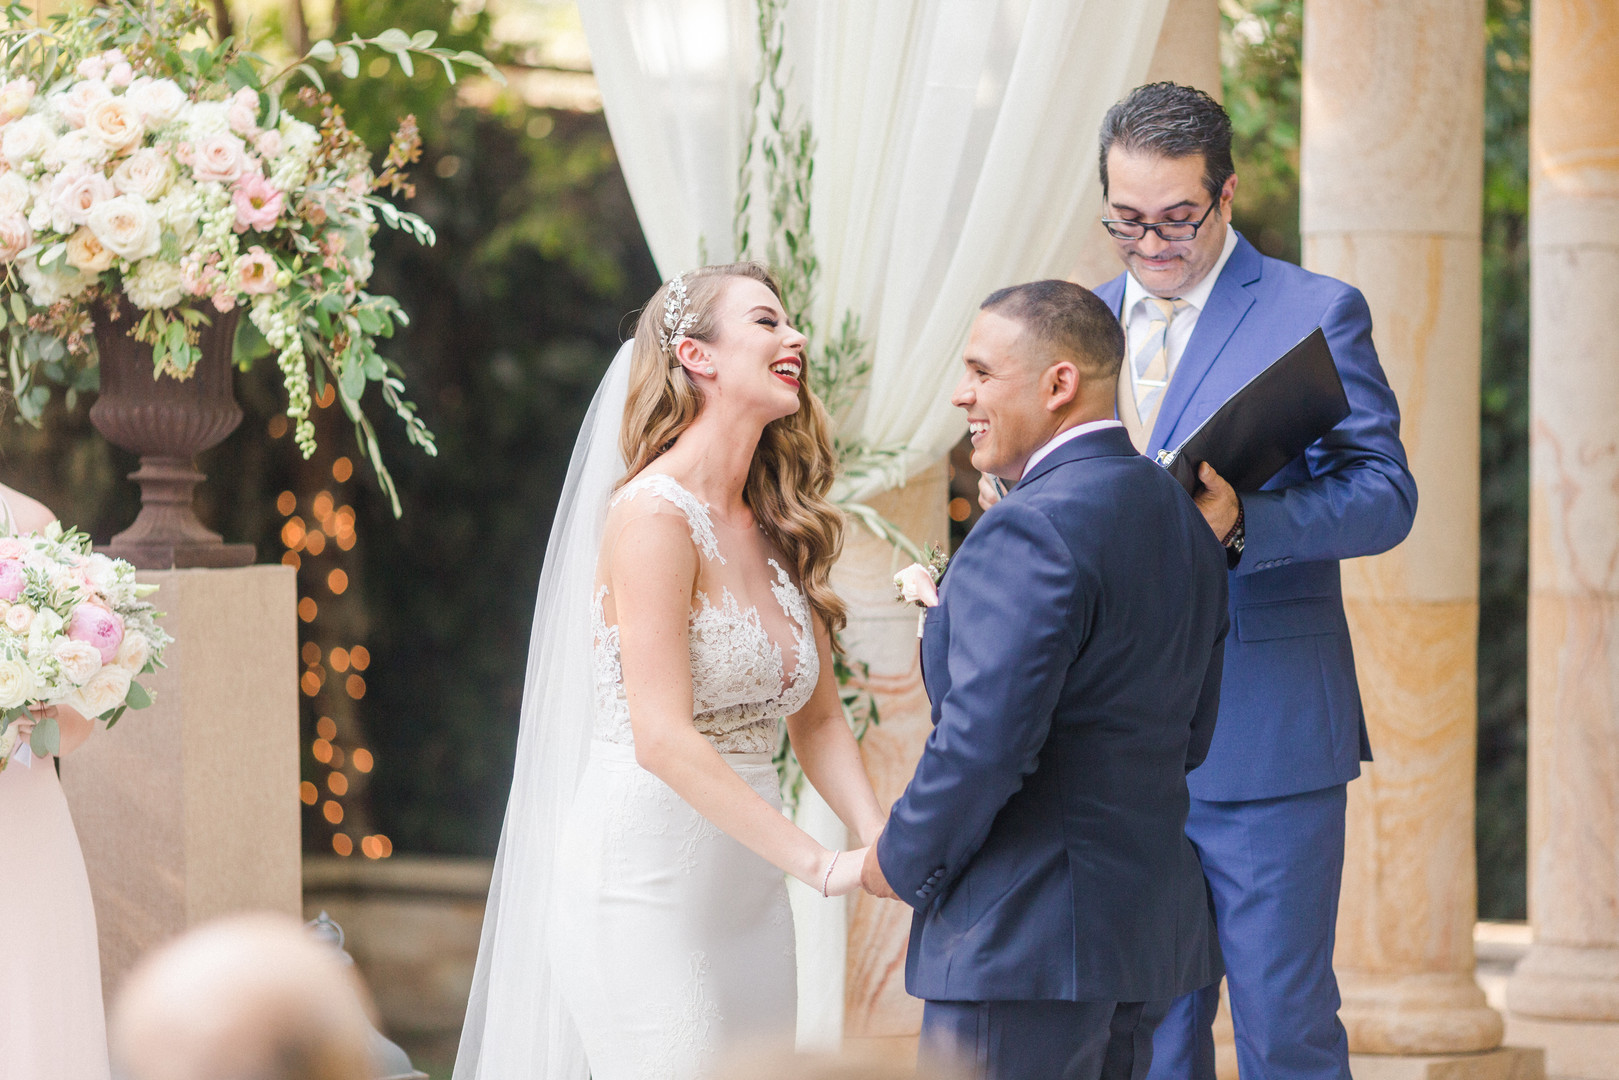 wedding-officiant-david-gomes-soundwavem